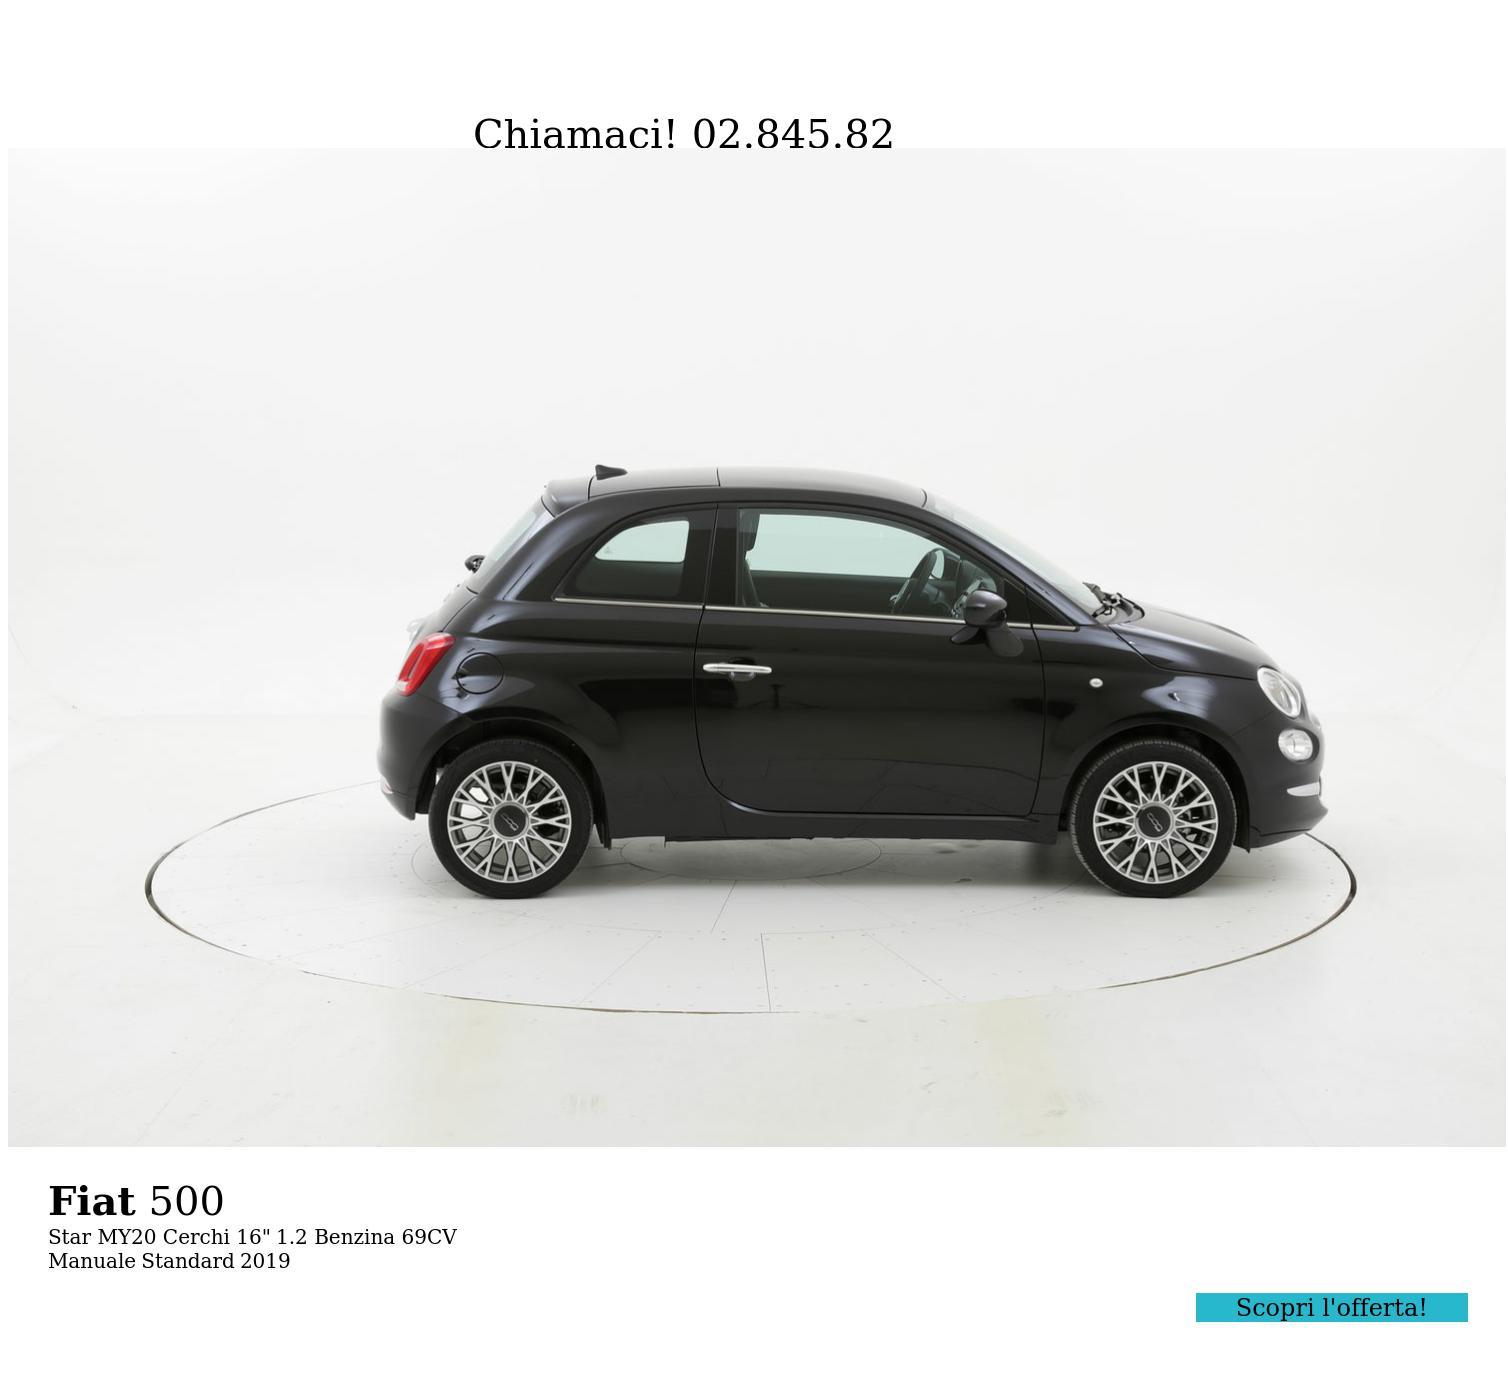 "Fiat 500 Star MY20 Cerchi 16"" km 0 benzina nera   brumbrum"